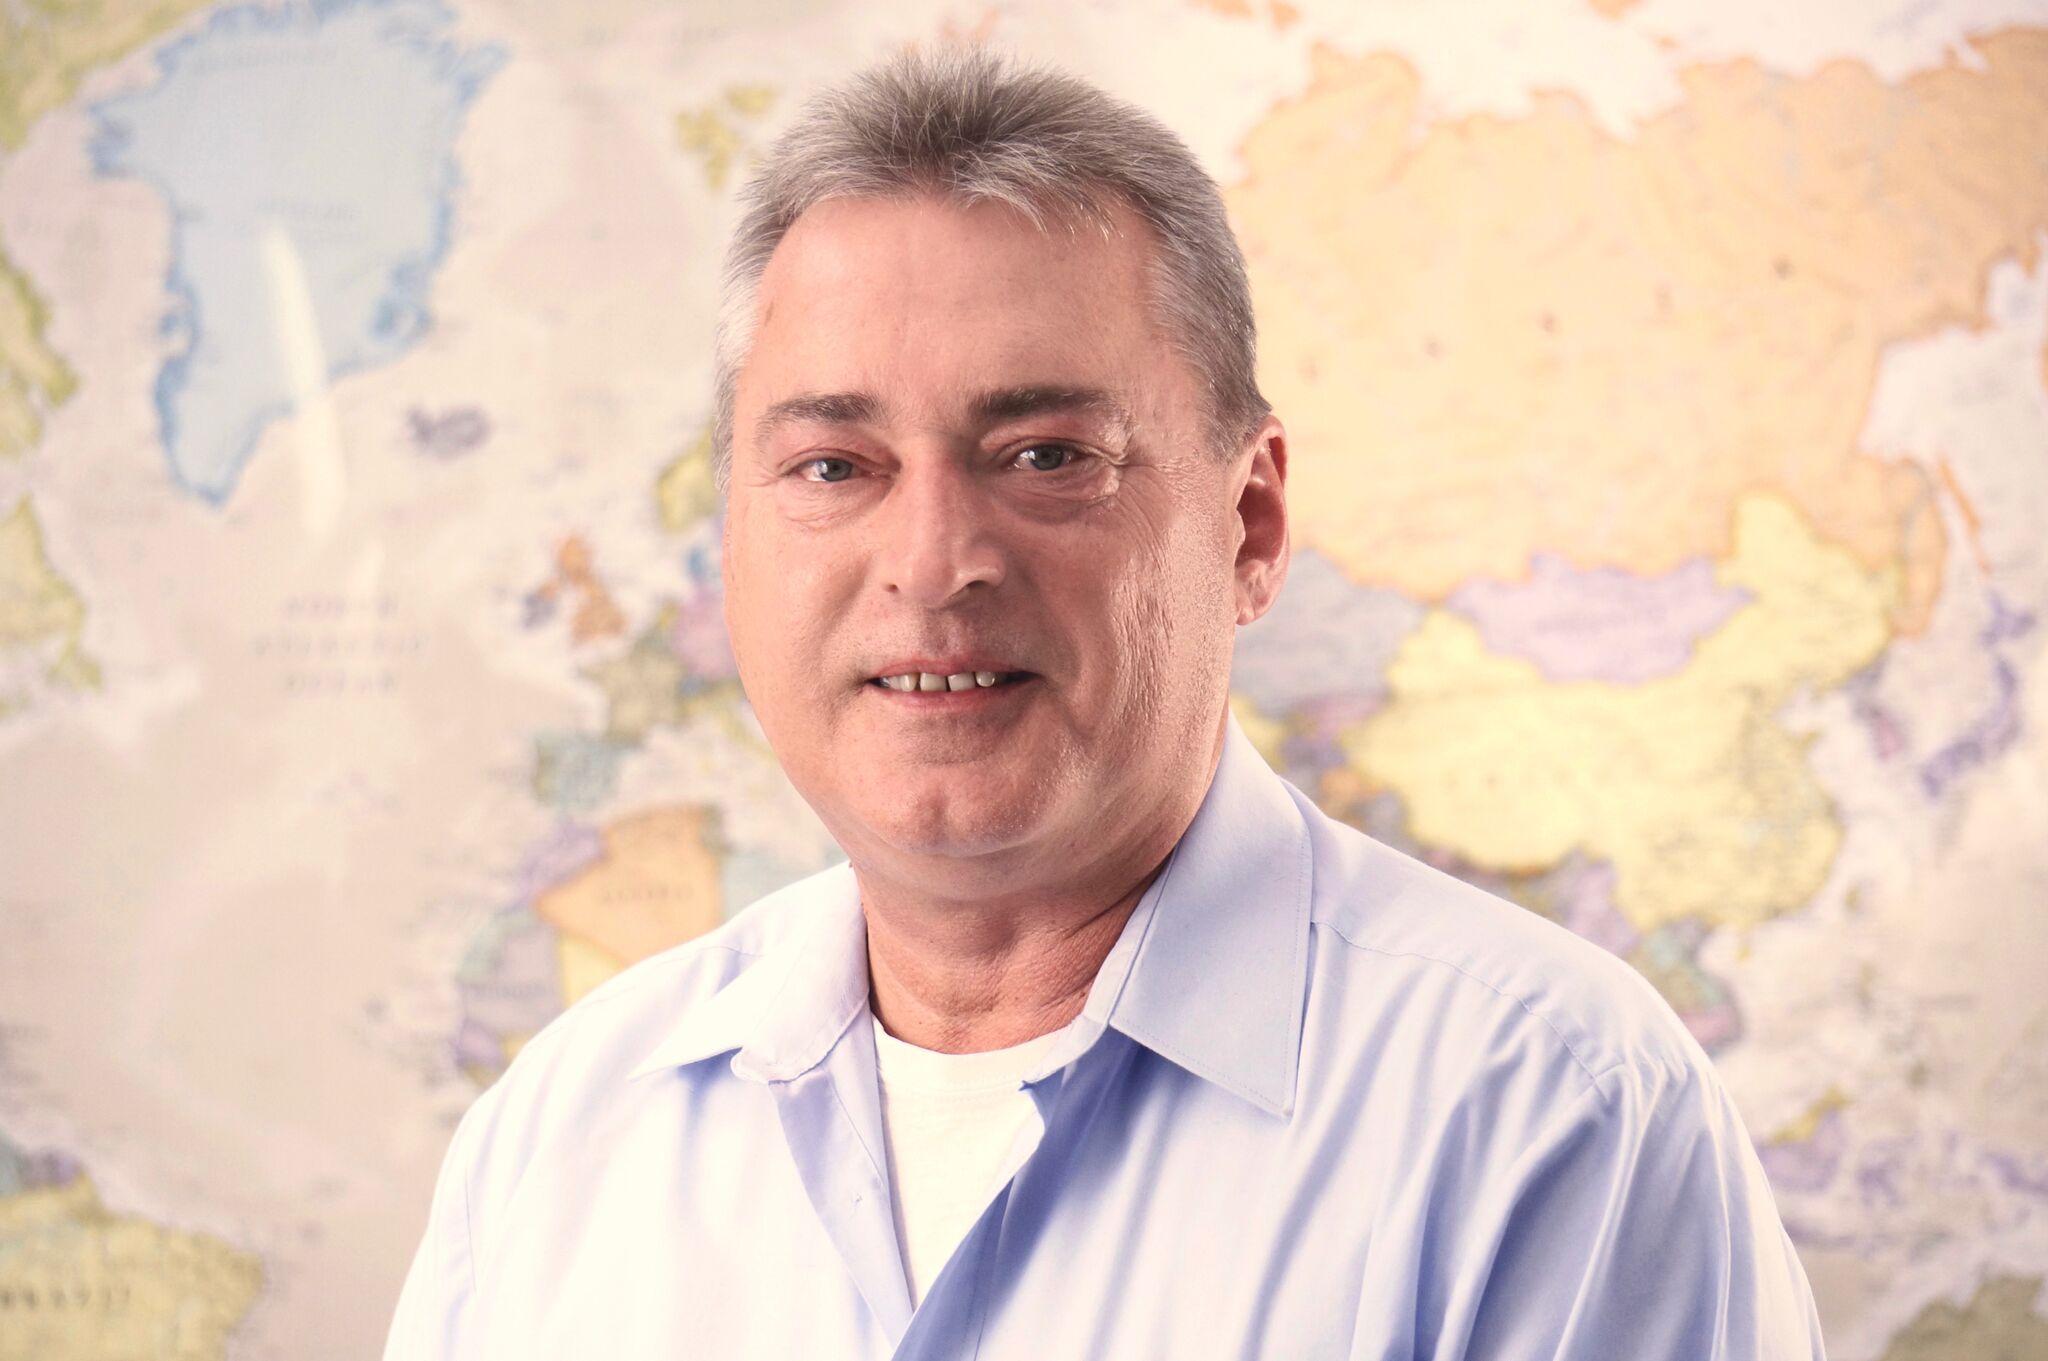 Hubert Grabowski